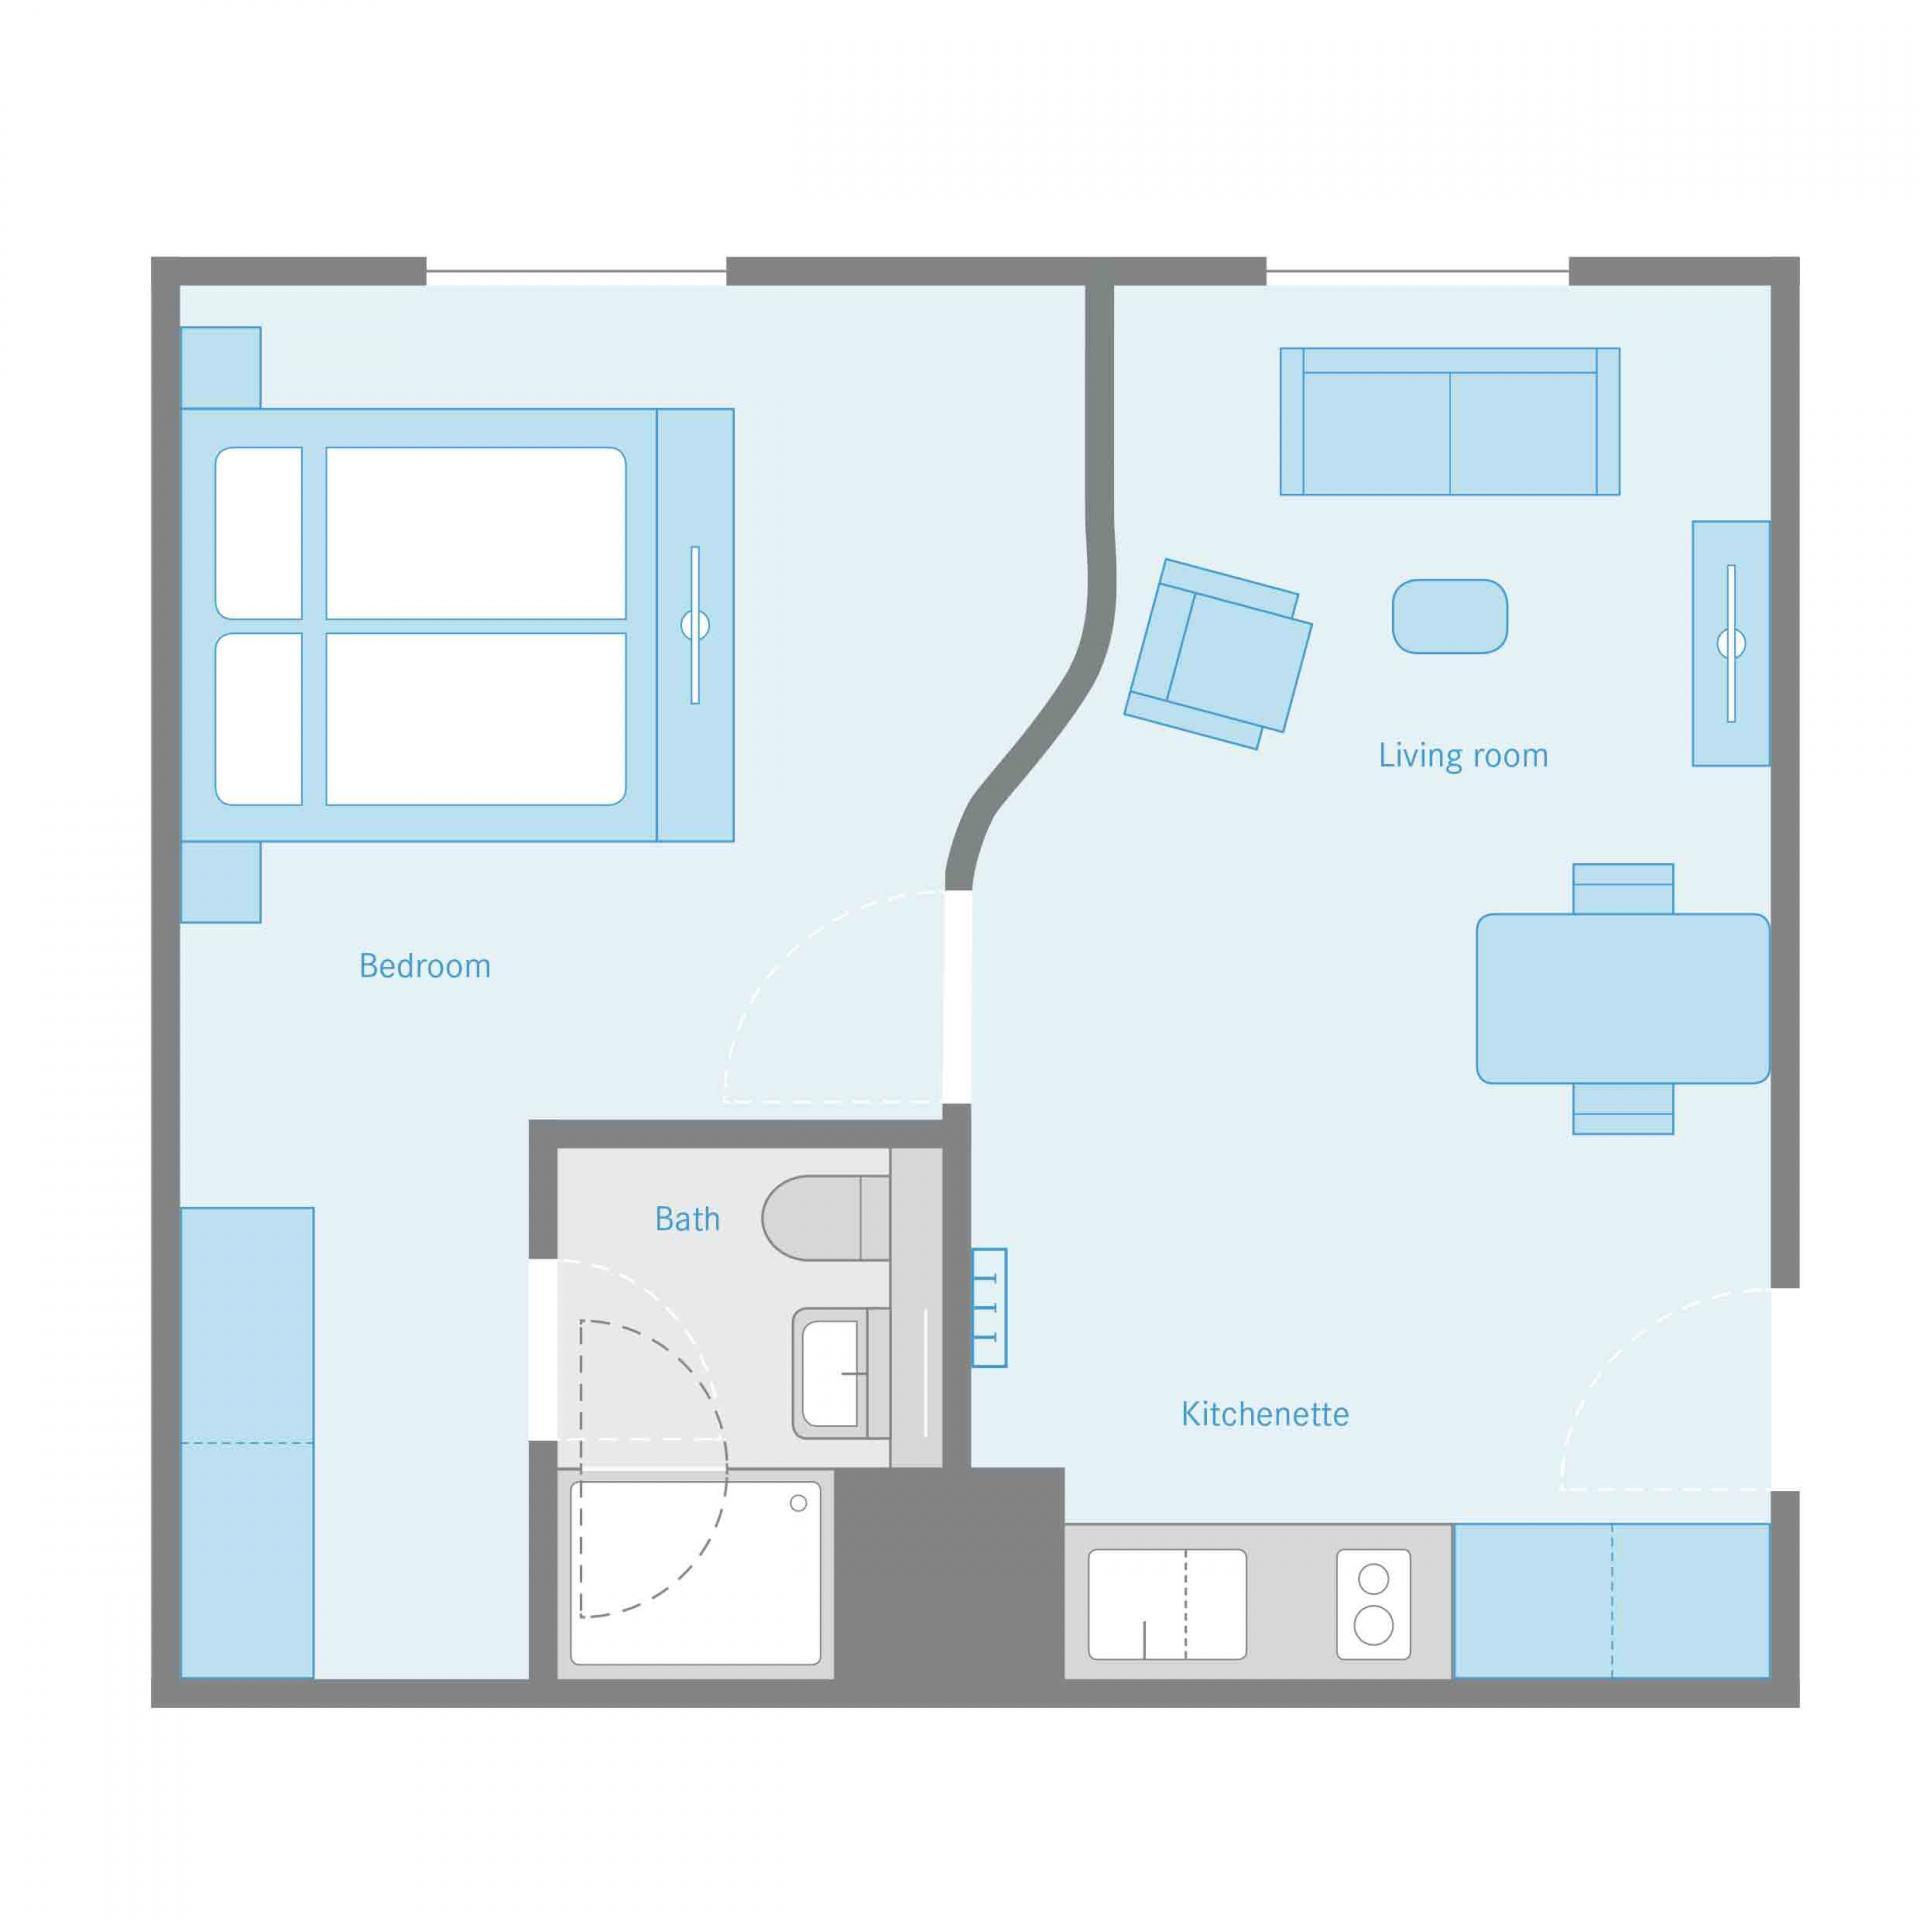 Apartment Floor Plan at the Munich Parkstadt Schwabing Apartments